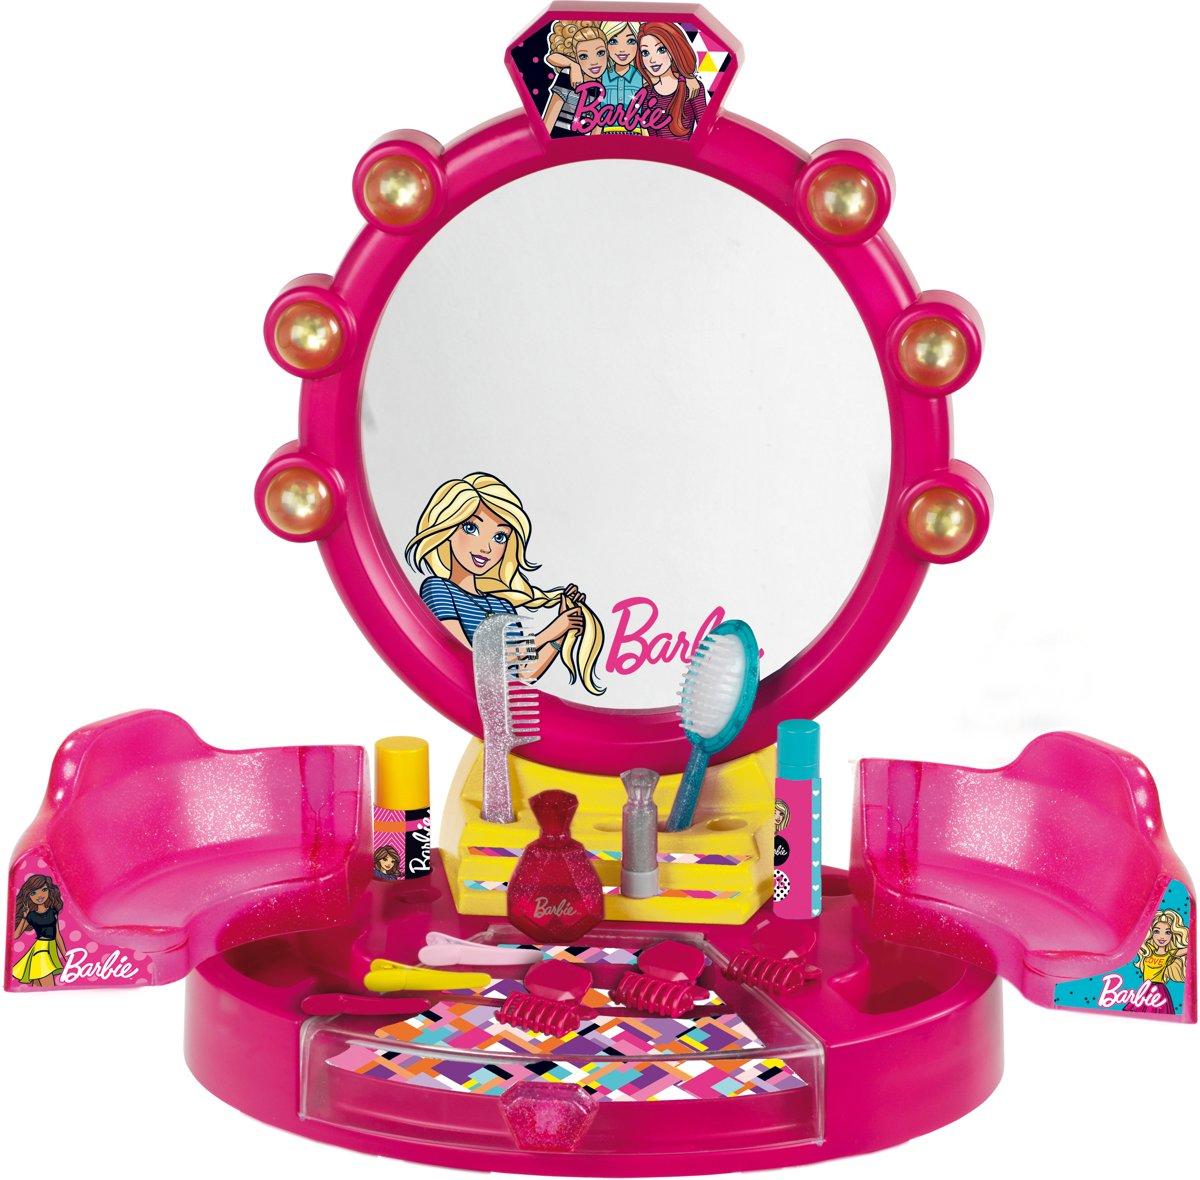 Barbie Beauty Center